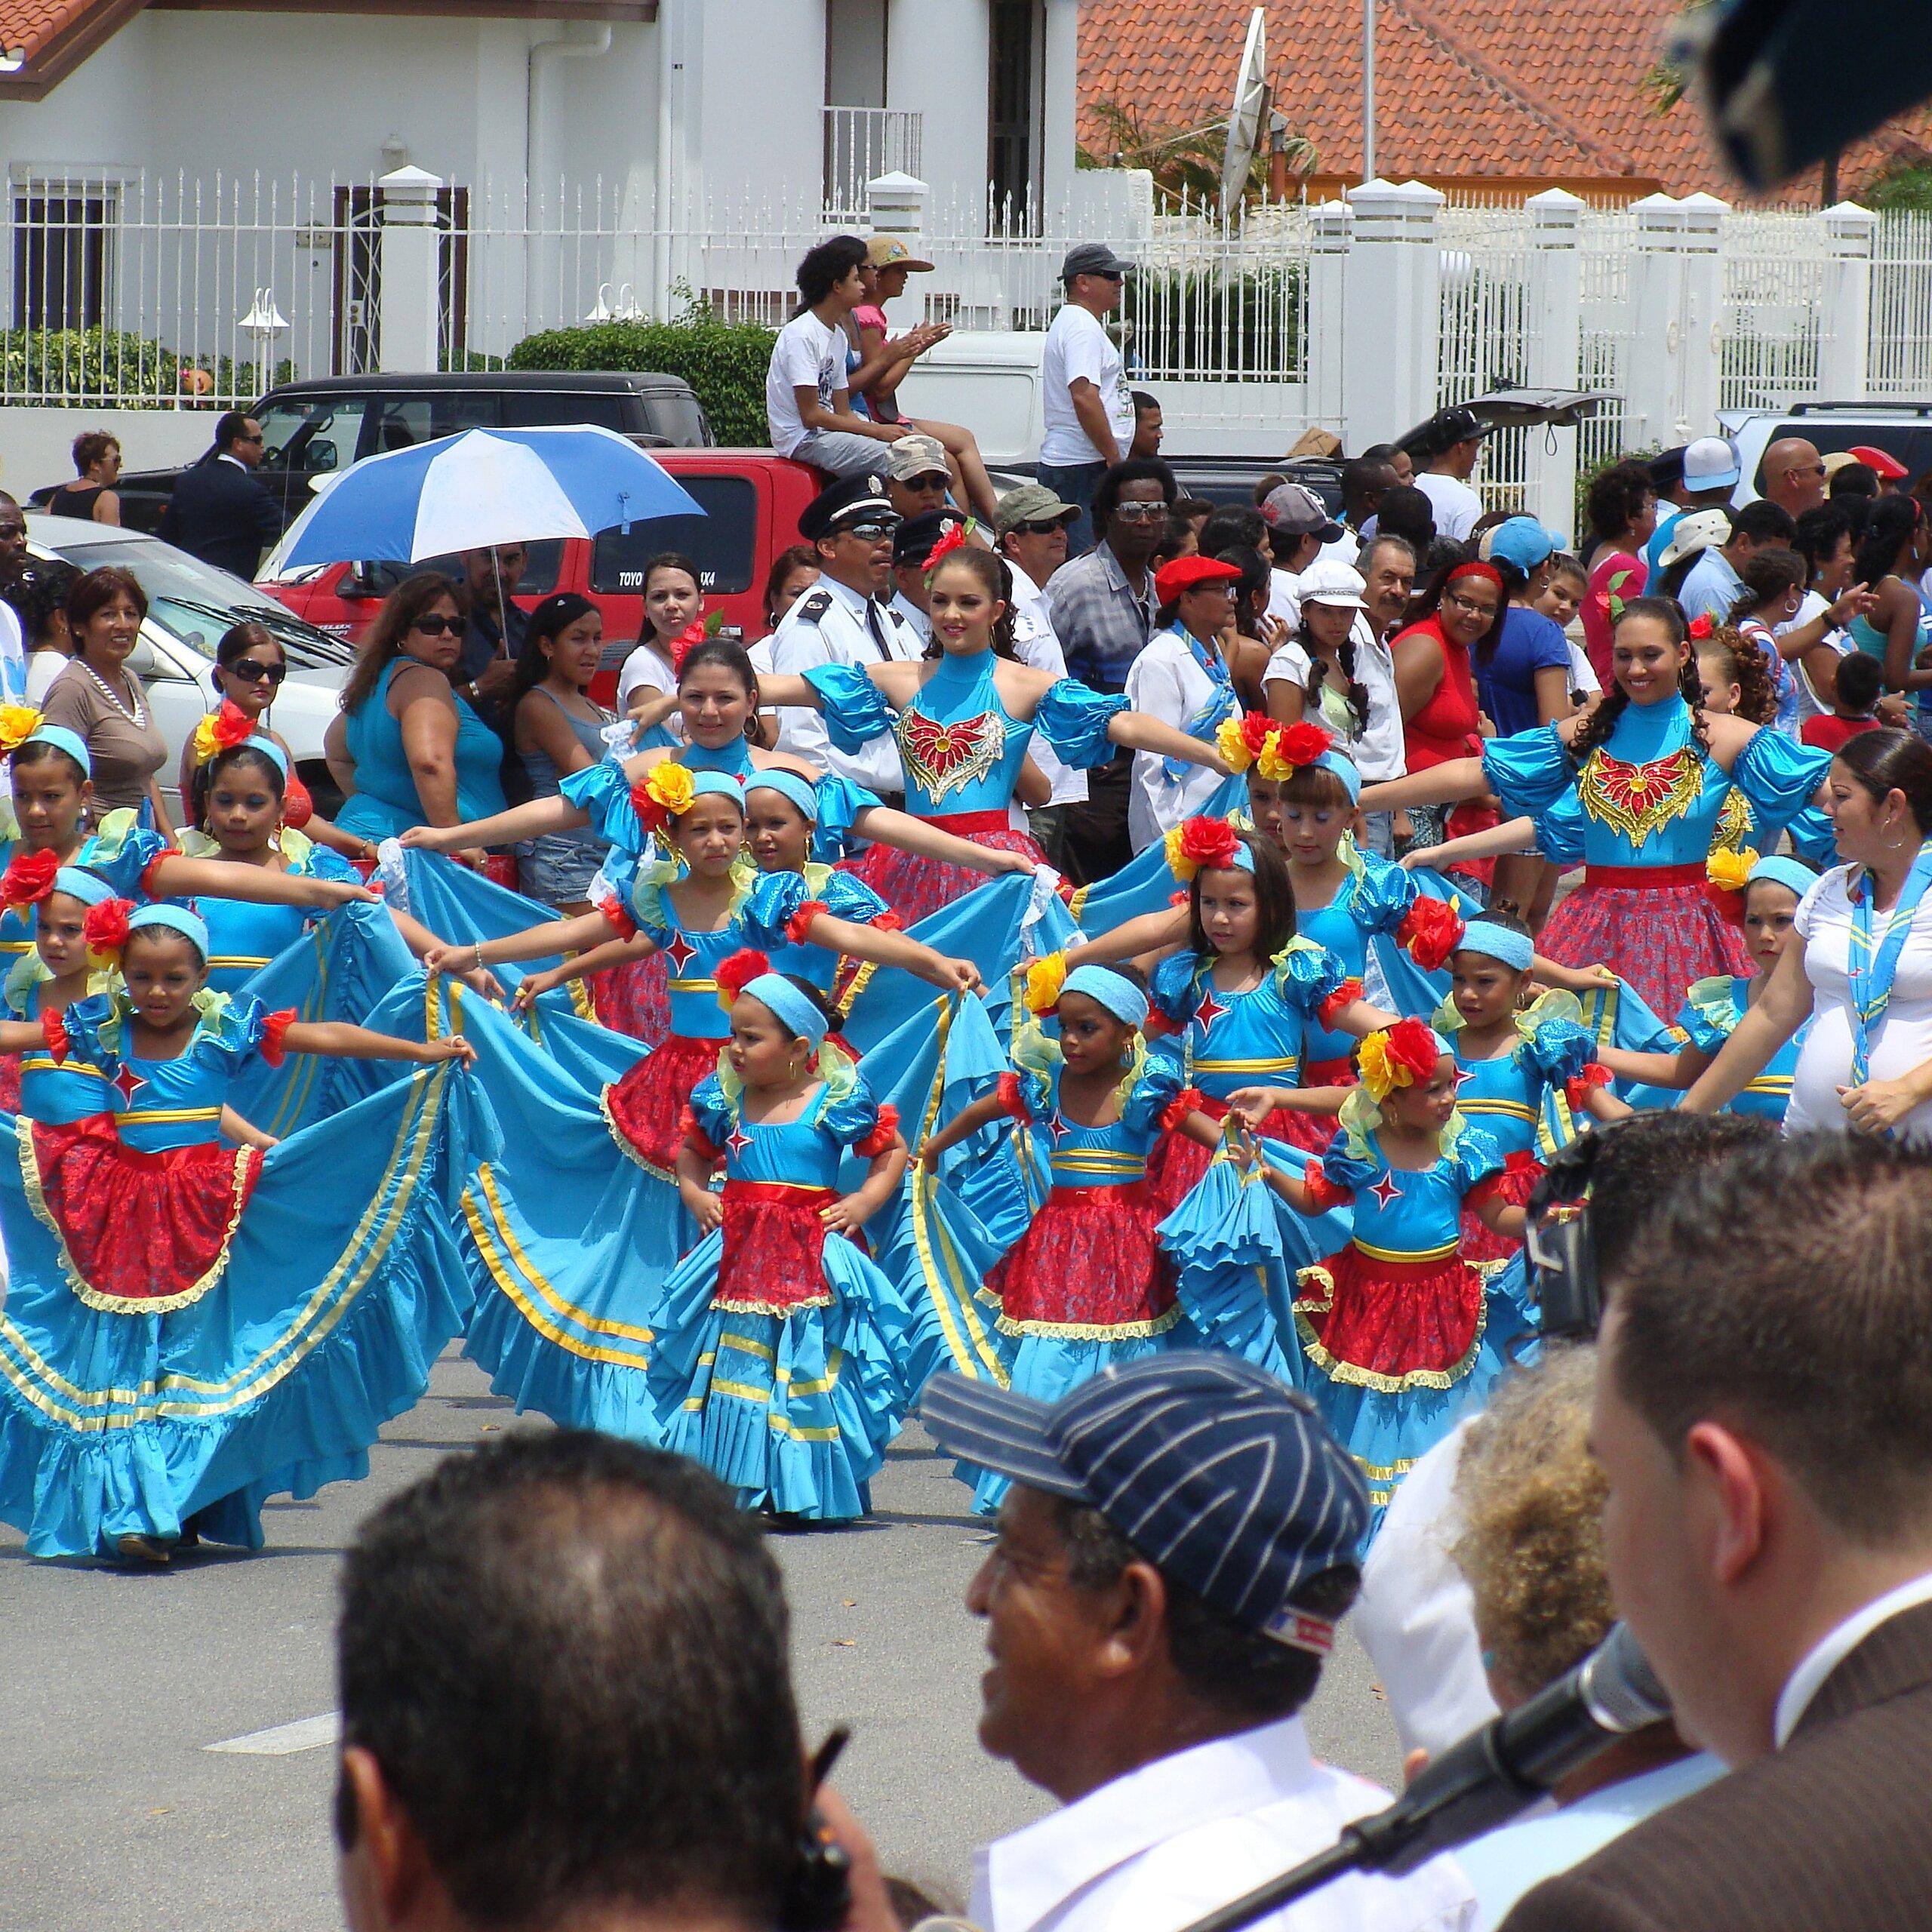 Aruba's Flag - Facts About the Flag of Aruba